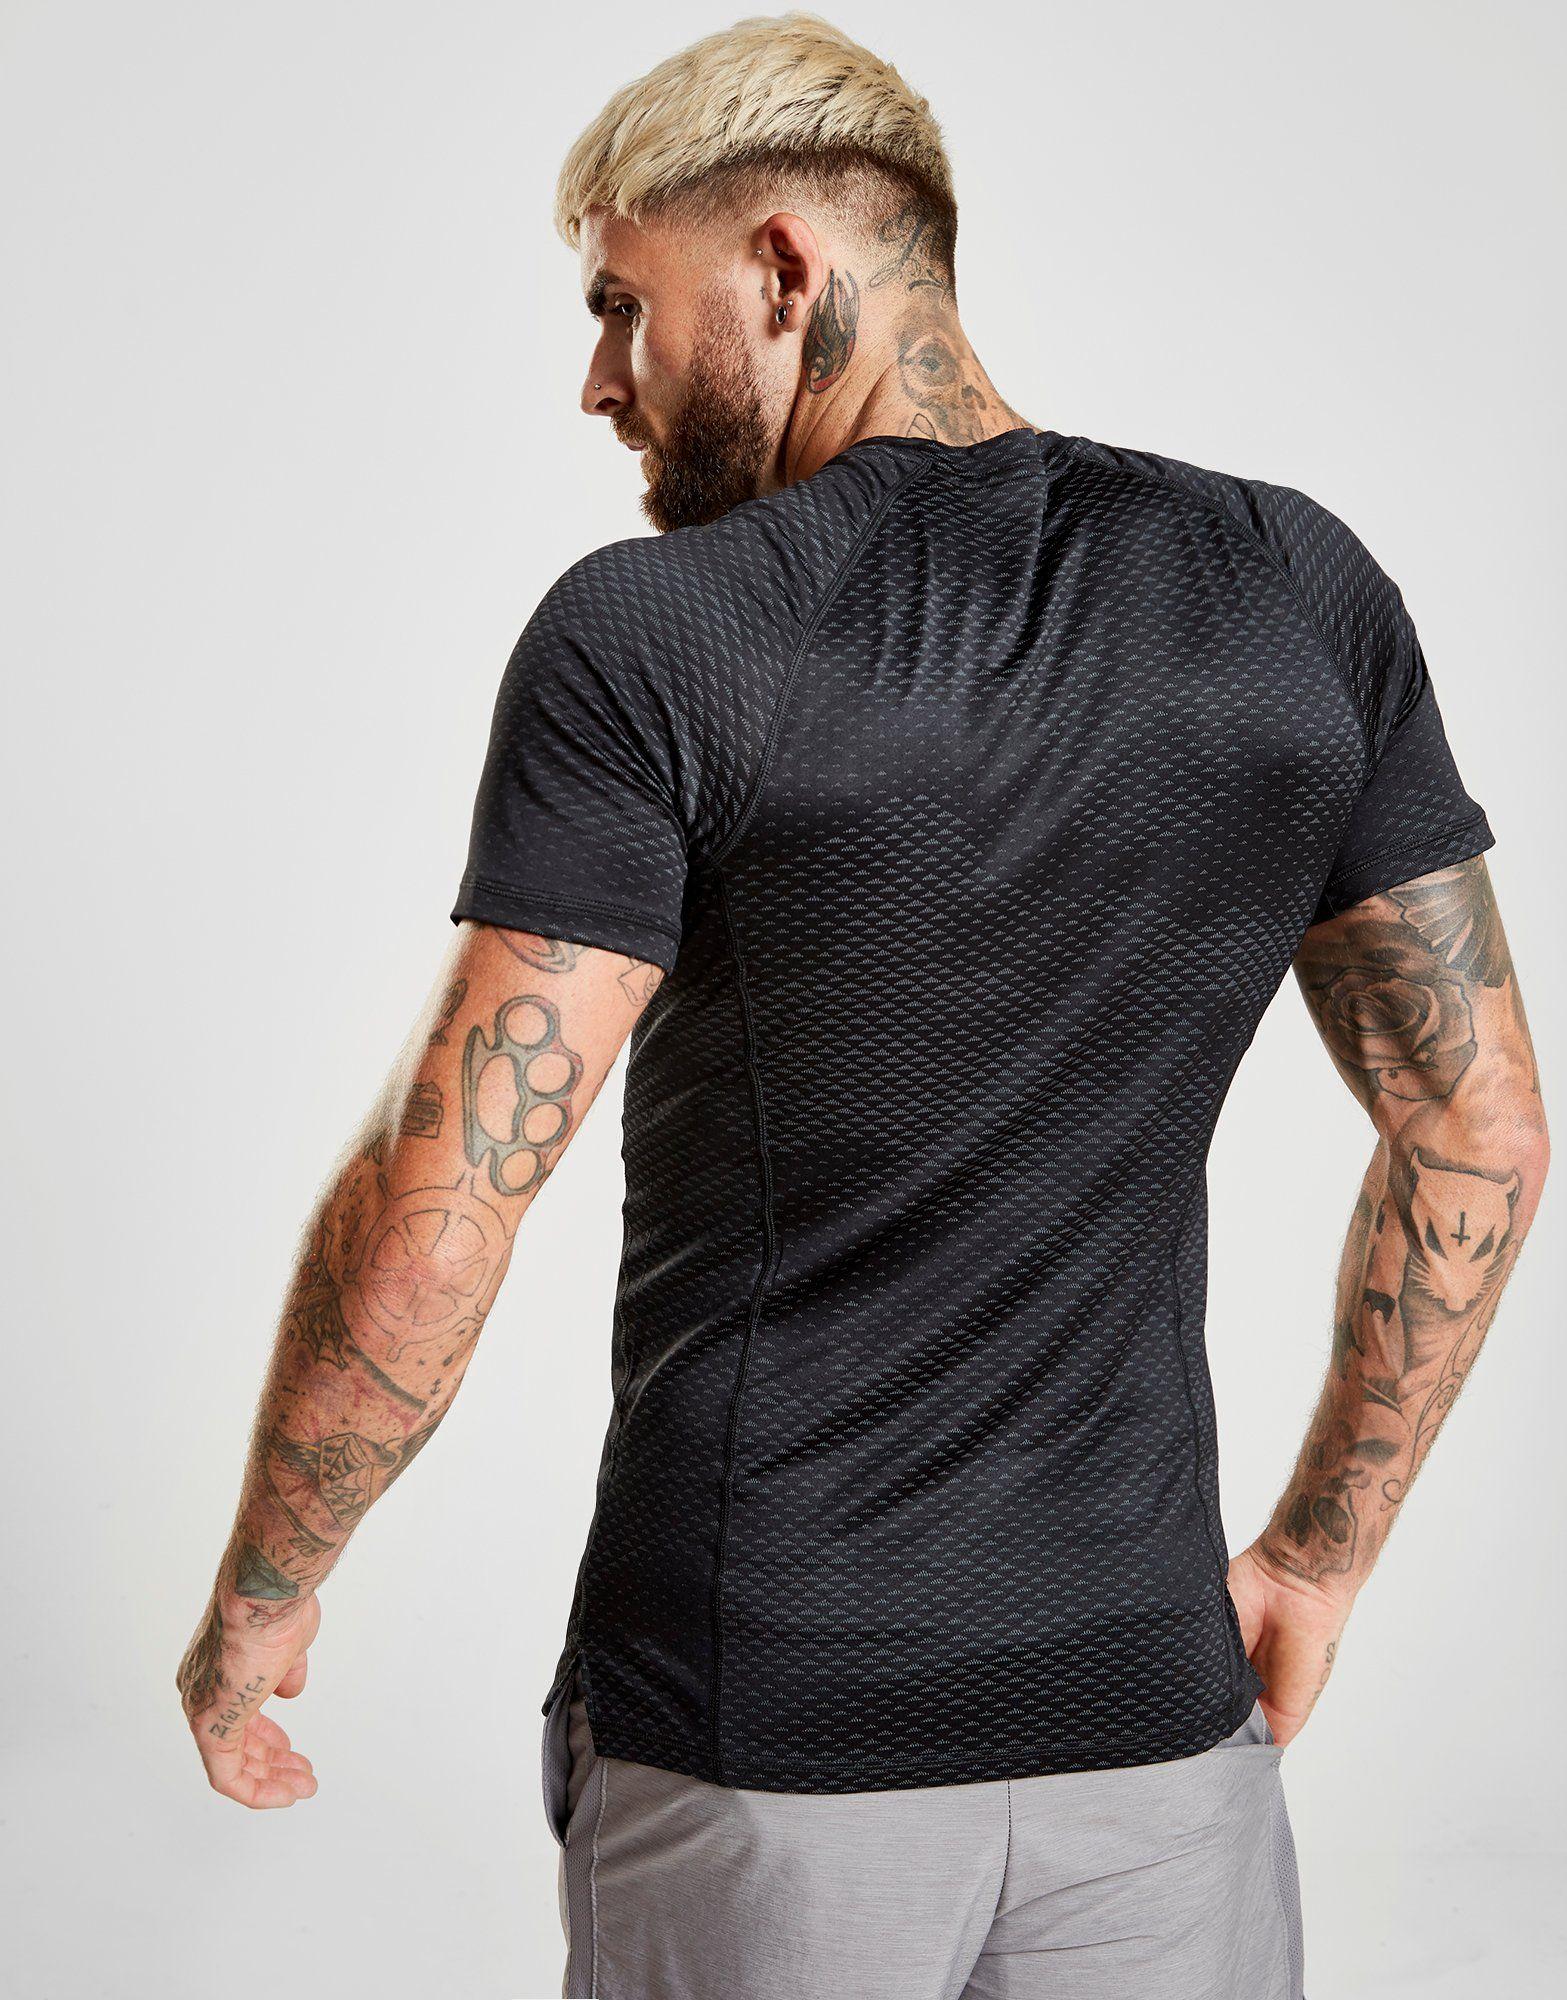 Nike Hypercool Short Sleeve Training Top